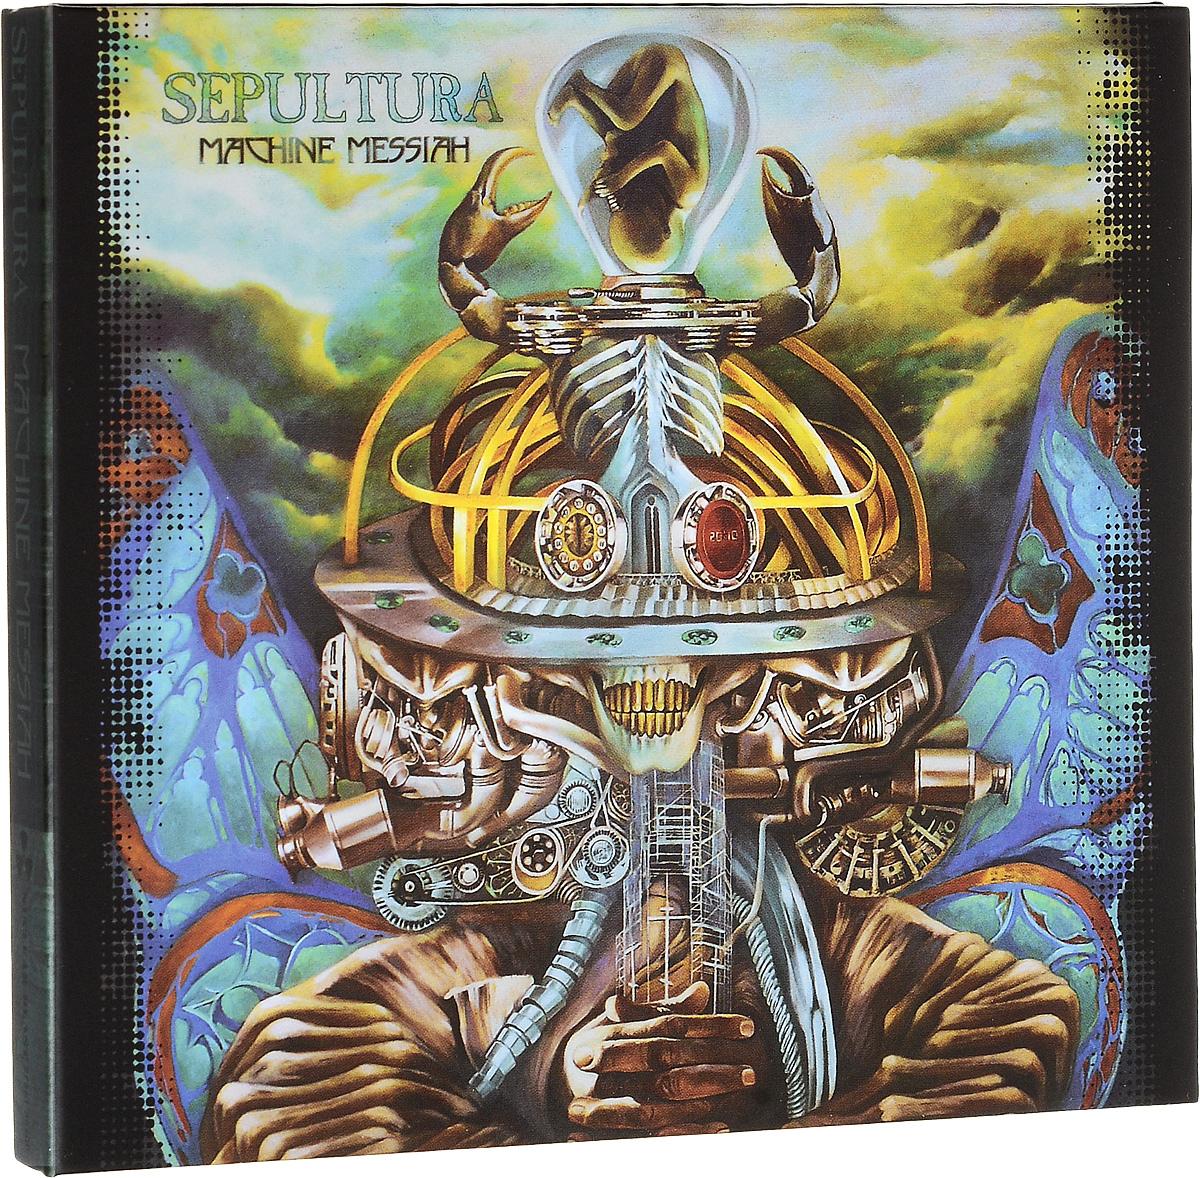 Sepultura Sepultura. Machine Messiah (CD + DVD) dream machine cd